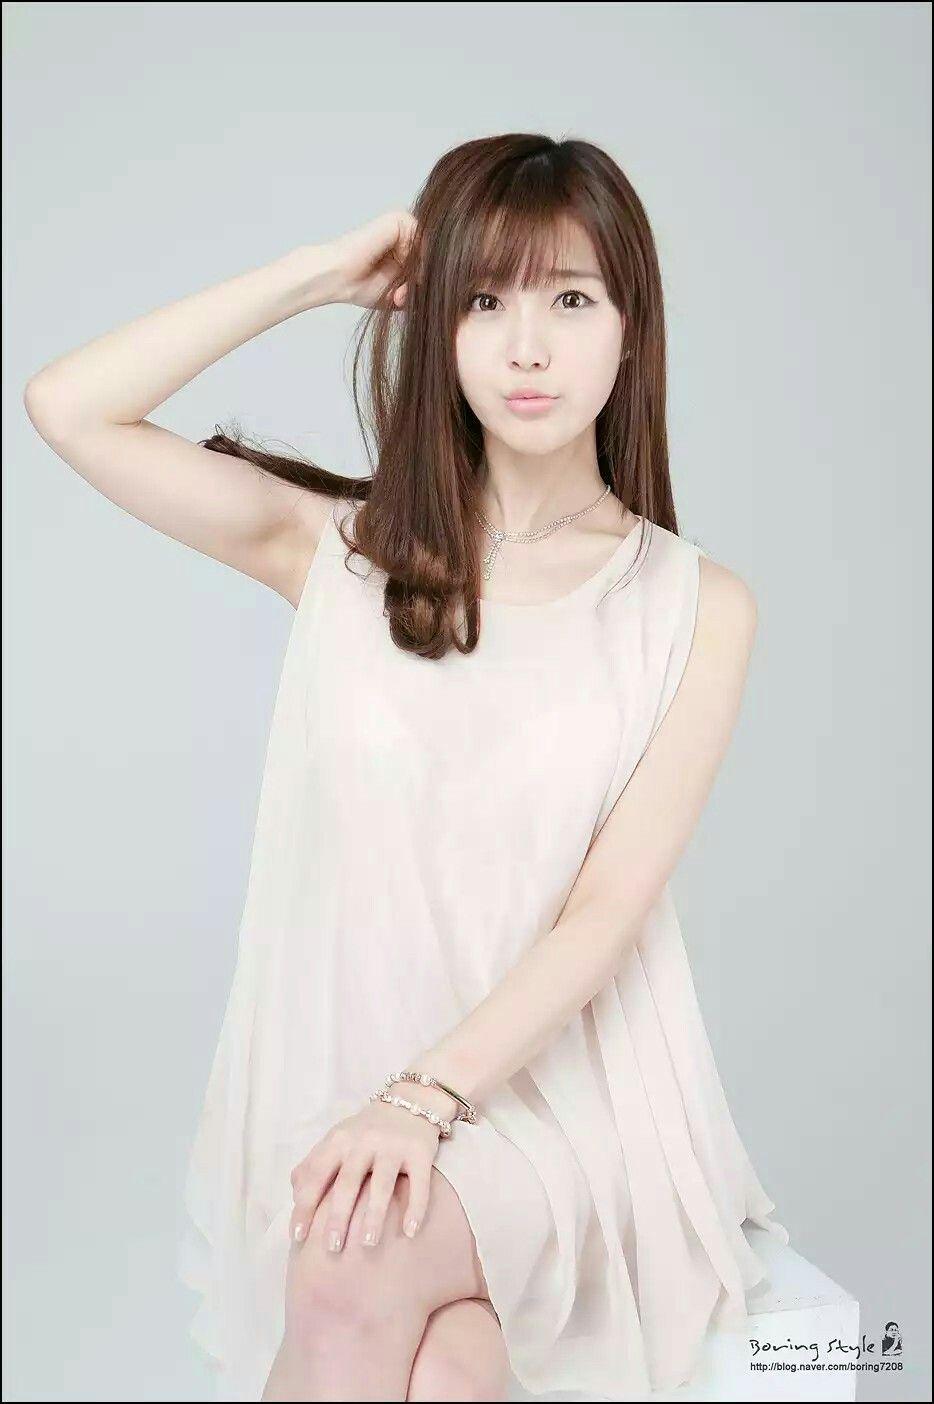 Choi Seul Gi Korean Girls Sporty, Cute, and Sexy